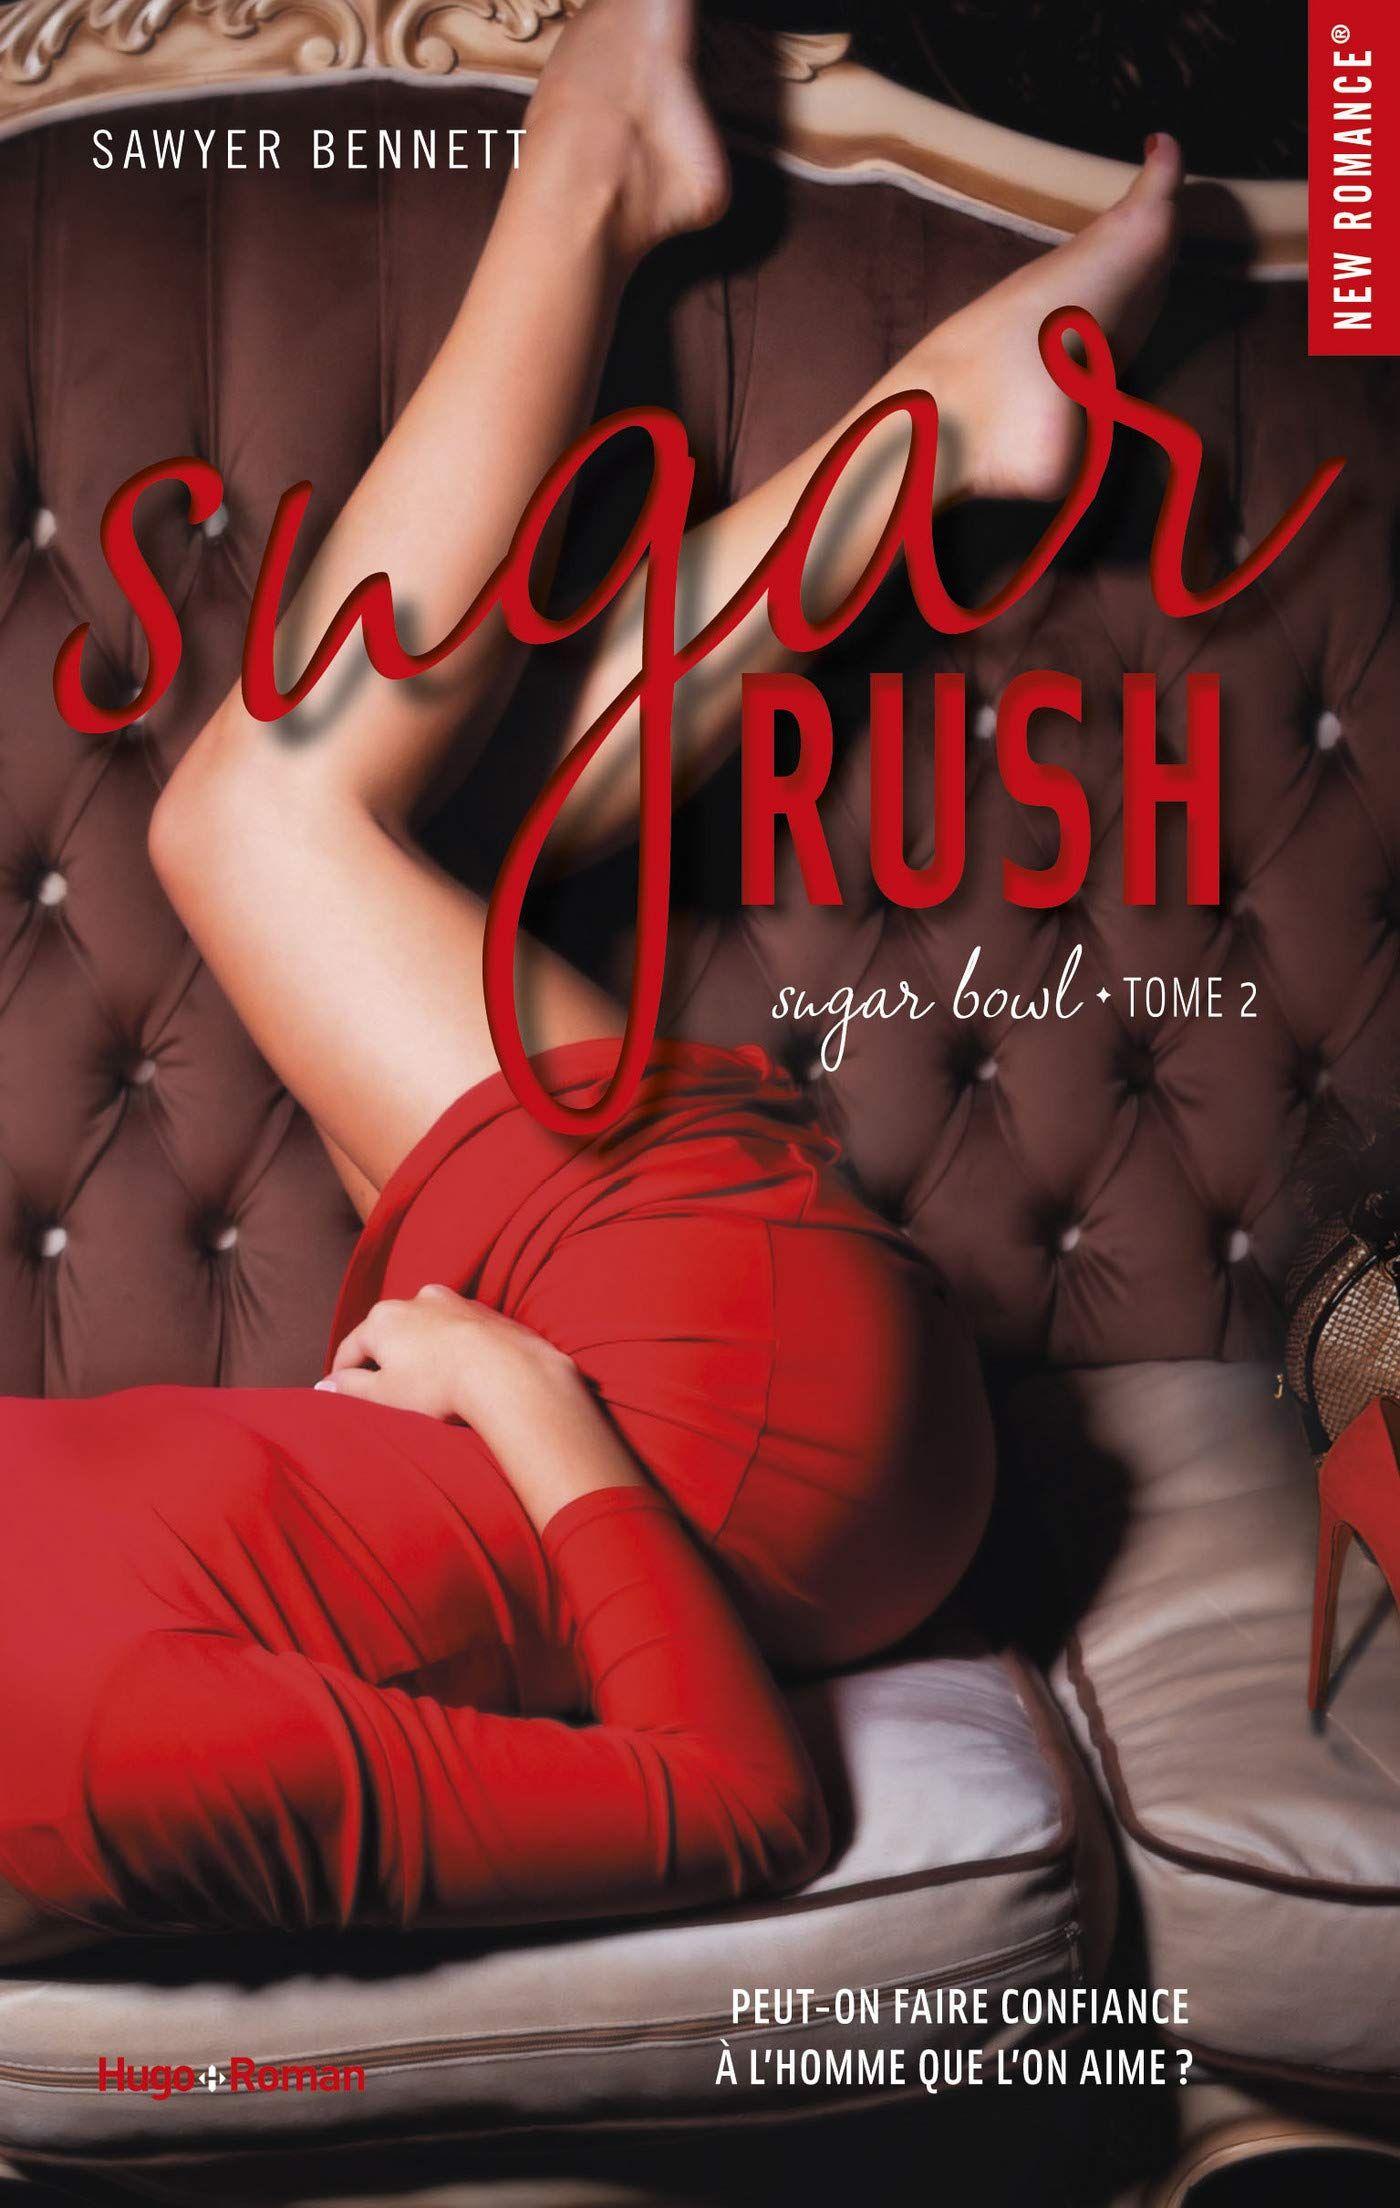 Telecharger Sugar Daddy Sugar Bowl Tome 1 New Romance En